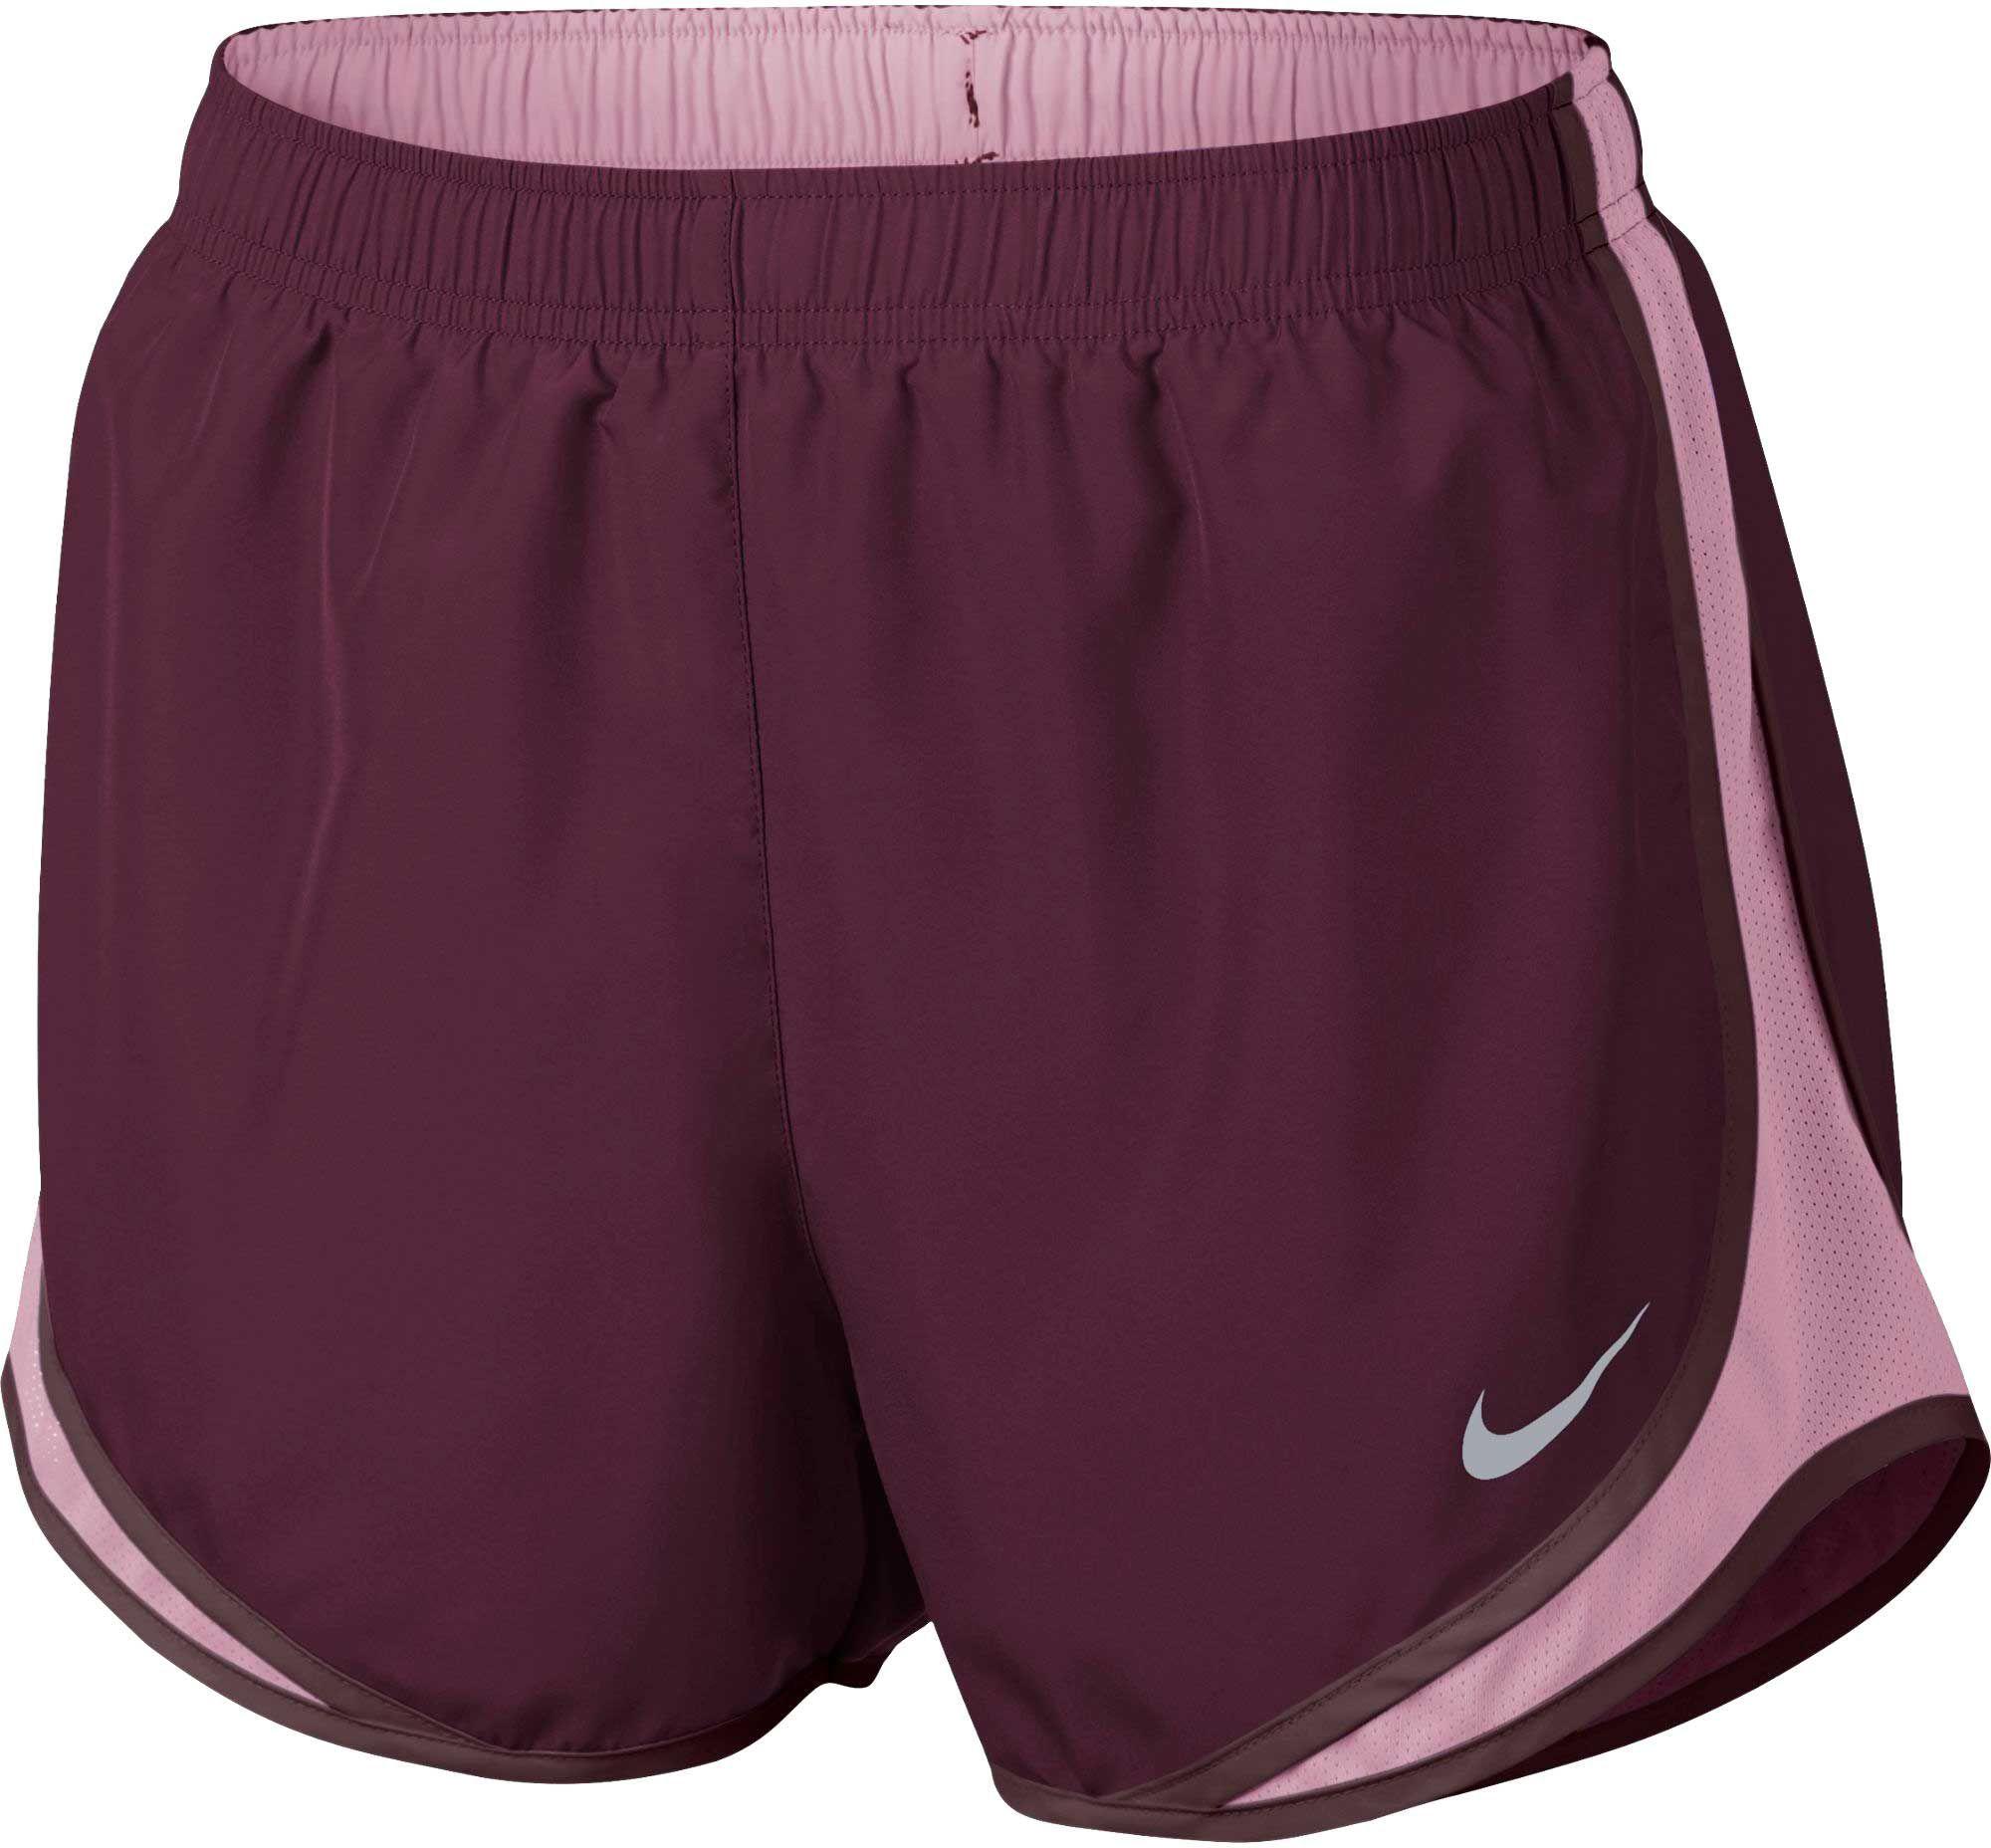 18dd7a218500c Nike Women s Dry Tempo Running Shorts